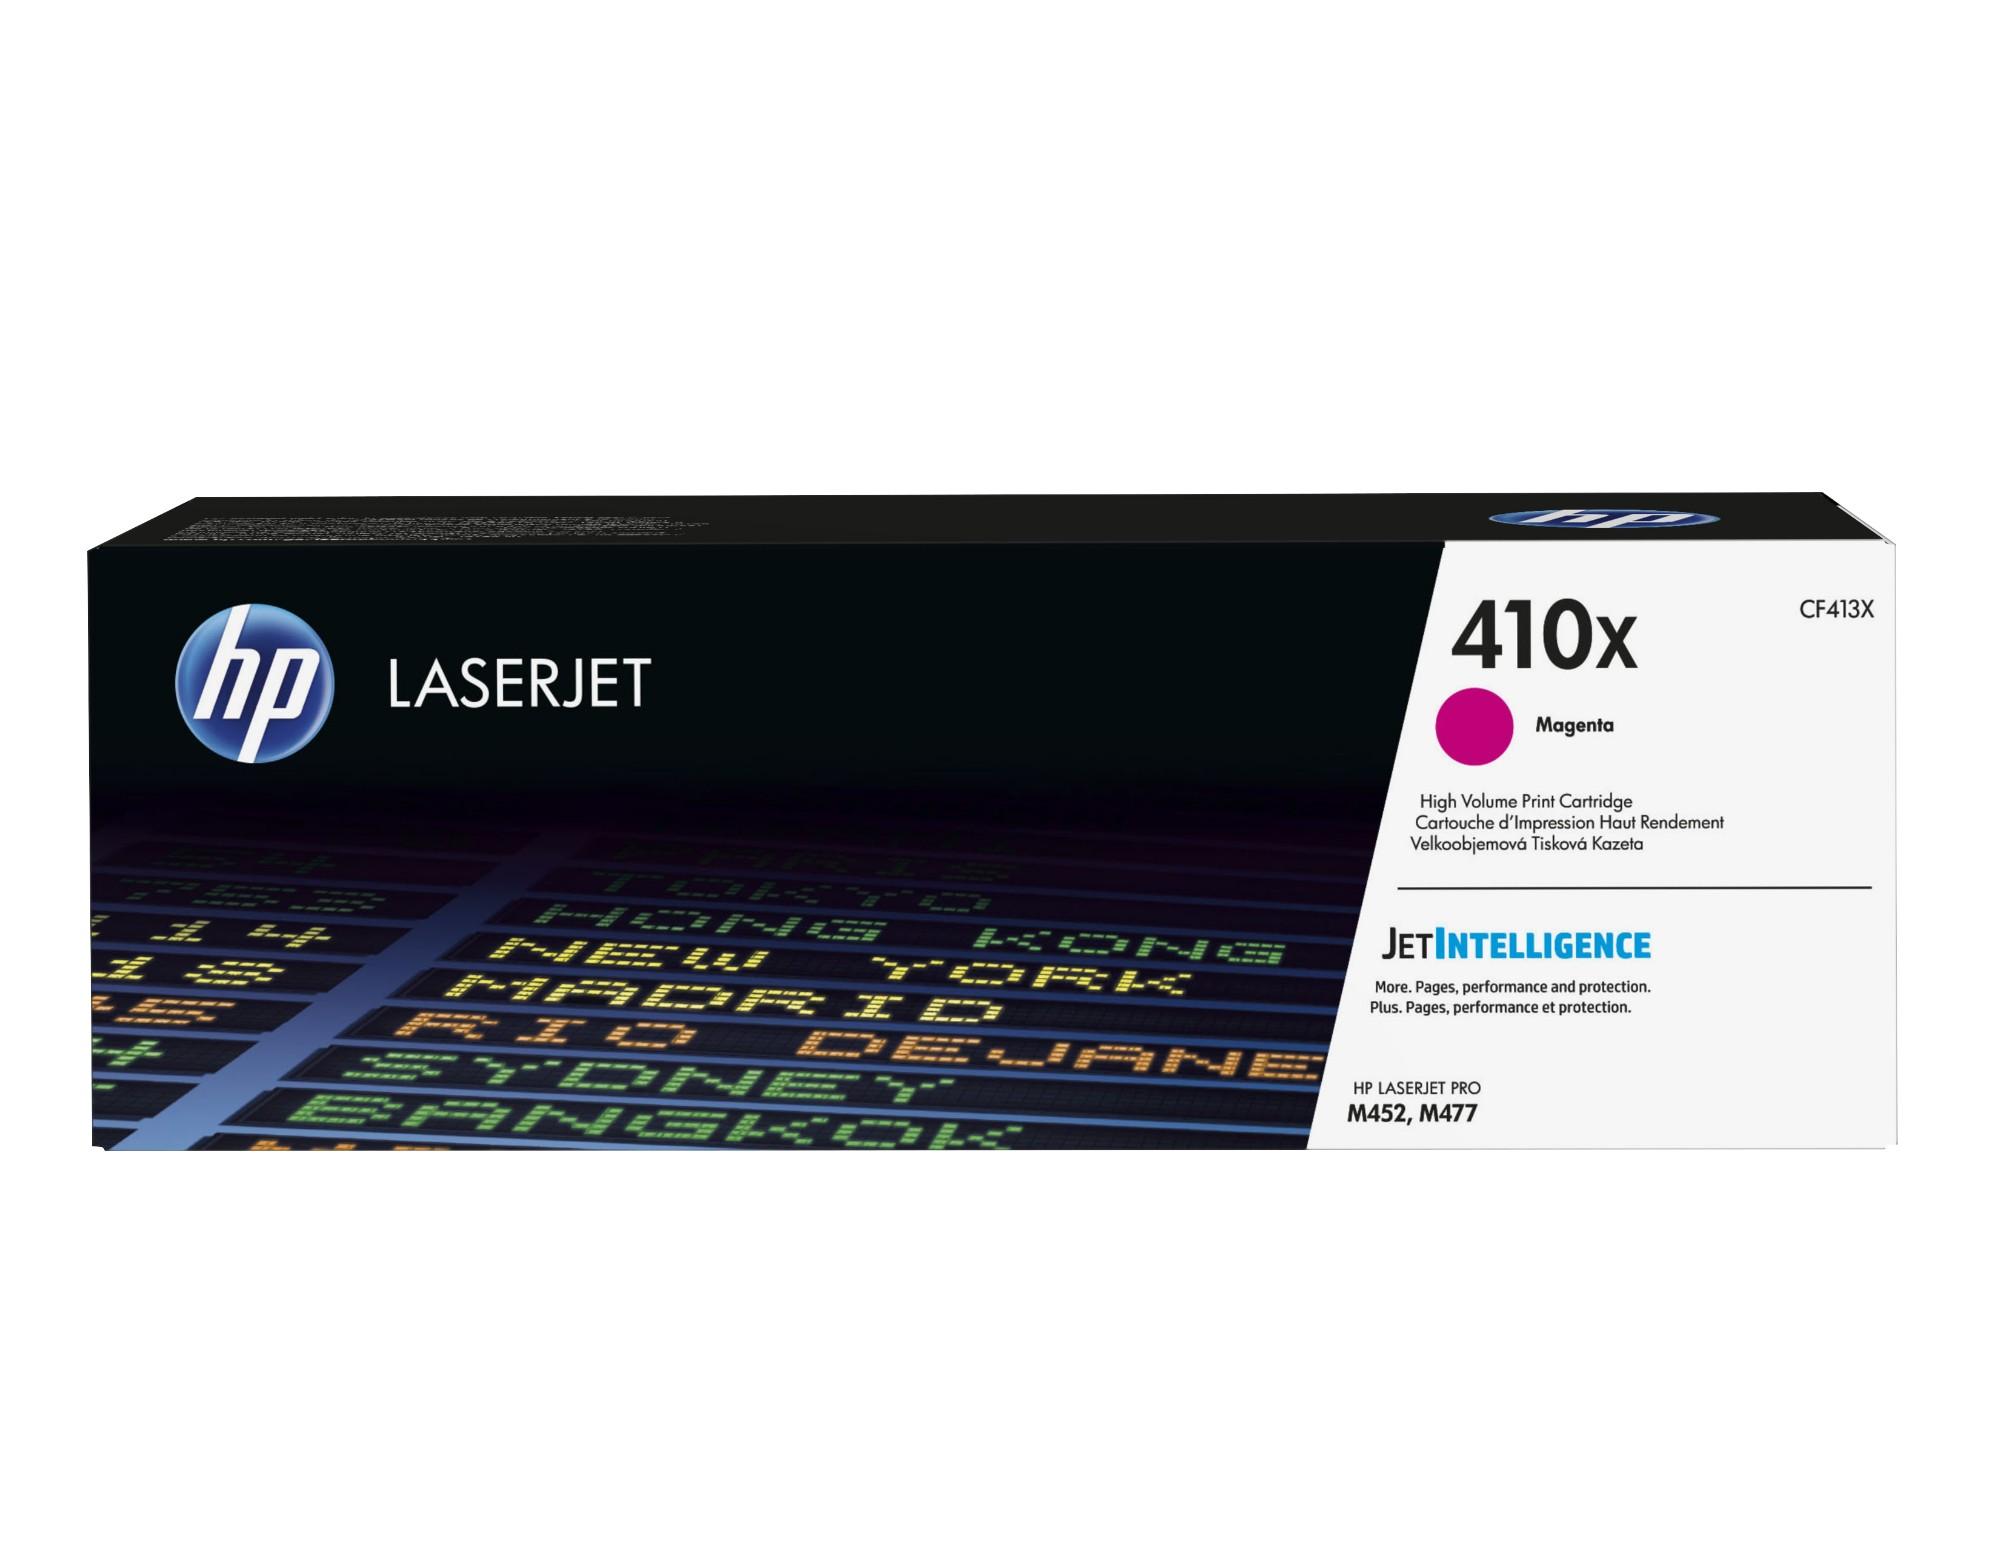 HP CF413X (410X) Toner magenta, 5K pages